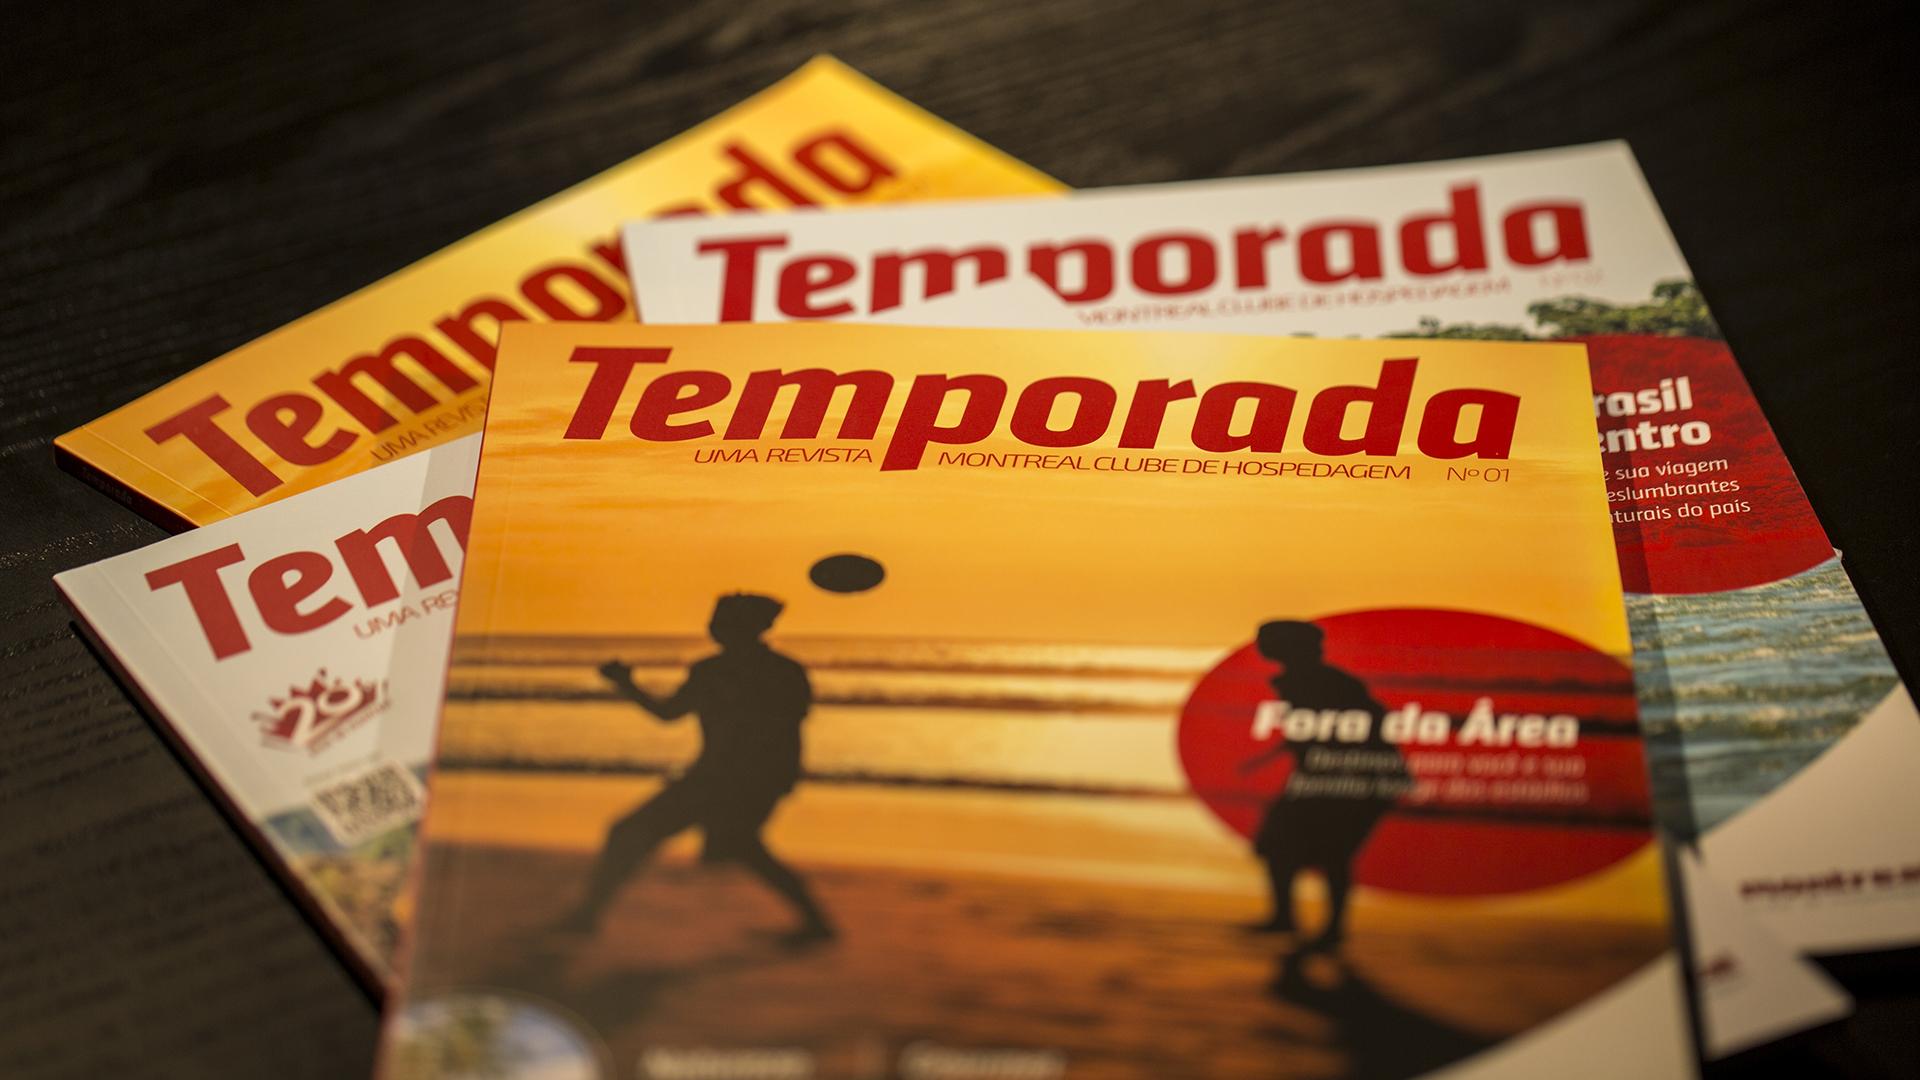 RevistaMontreal_SiteFERMENTO_1920x1080px_12_14_0004_5